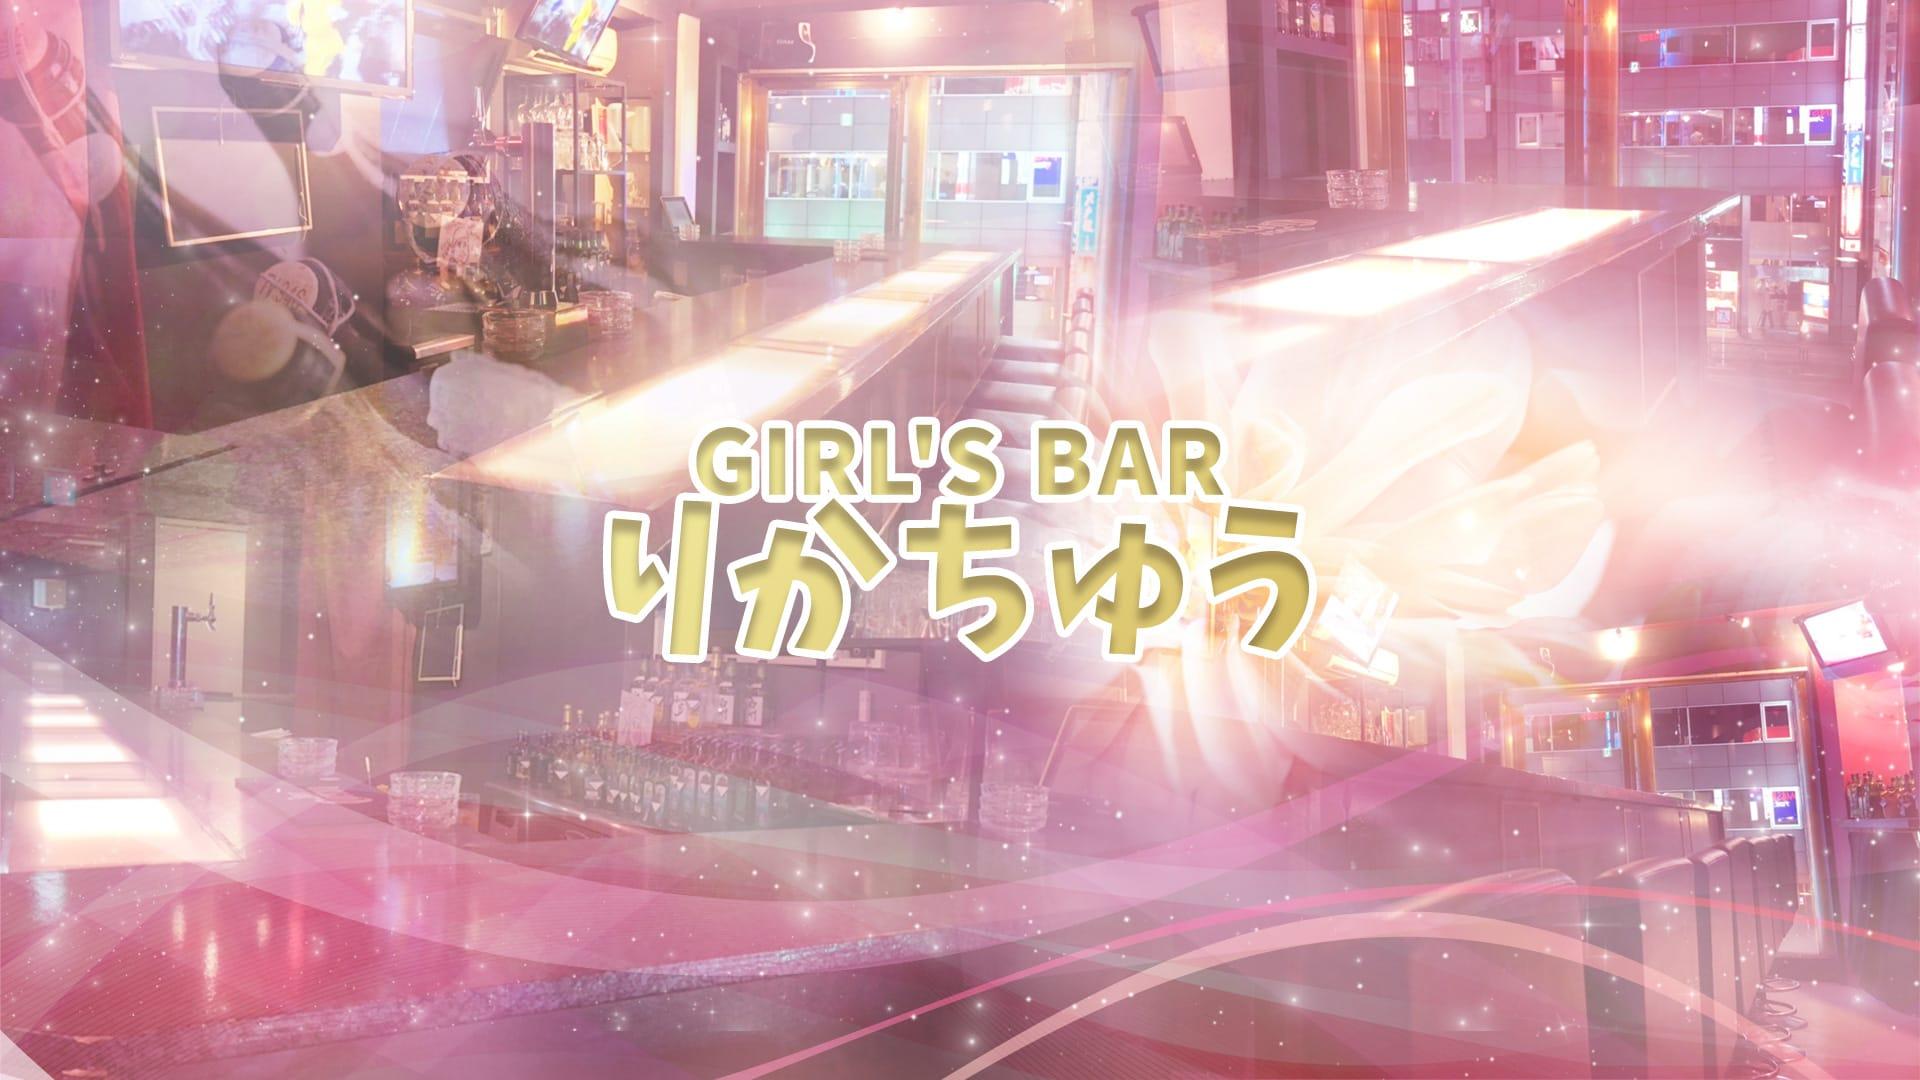 Girl's Barりかちゅう 六本木 ガールズバー TOP画像